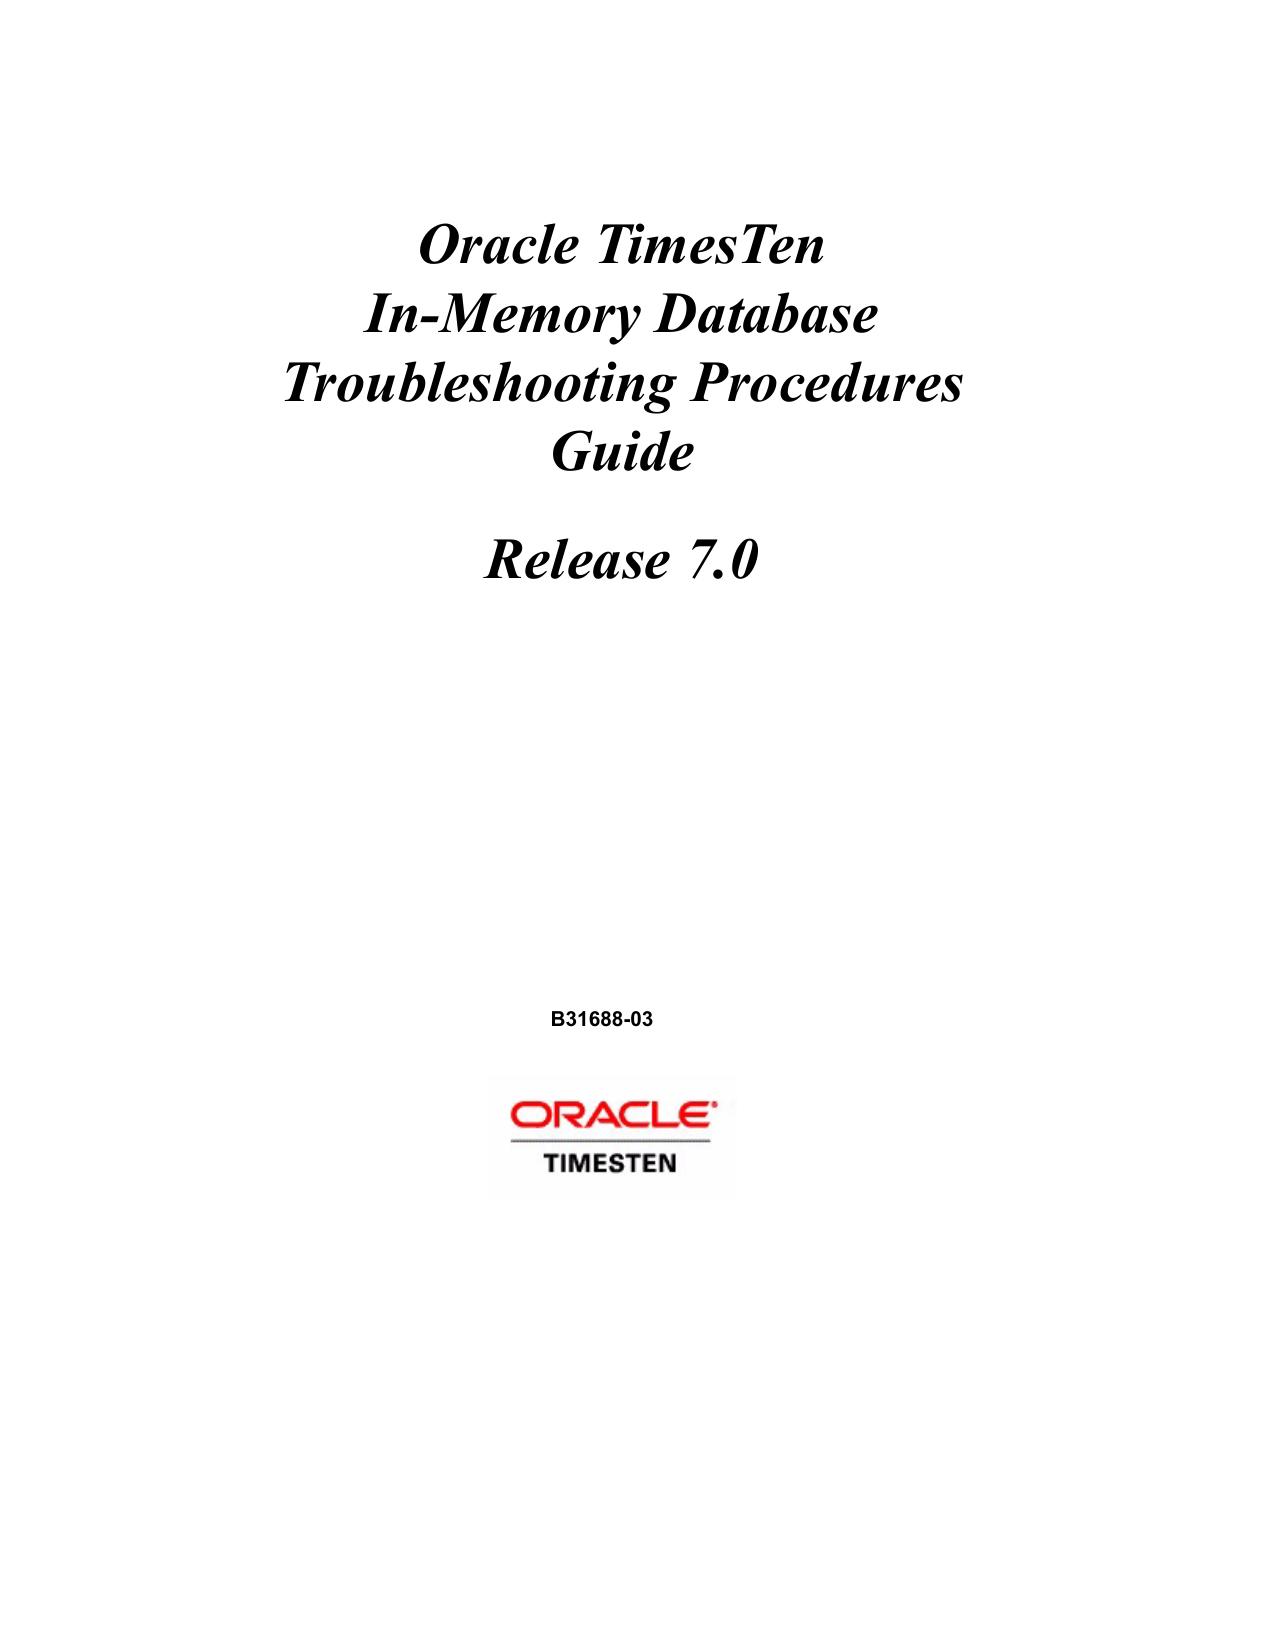 Oracle TimesTen In-Memory Database Troubleshooting